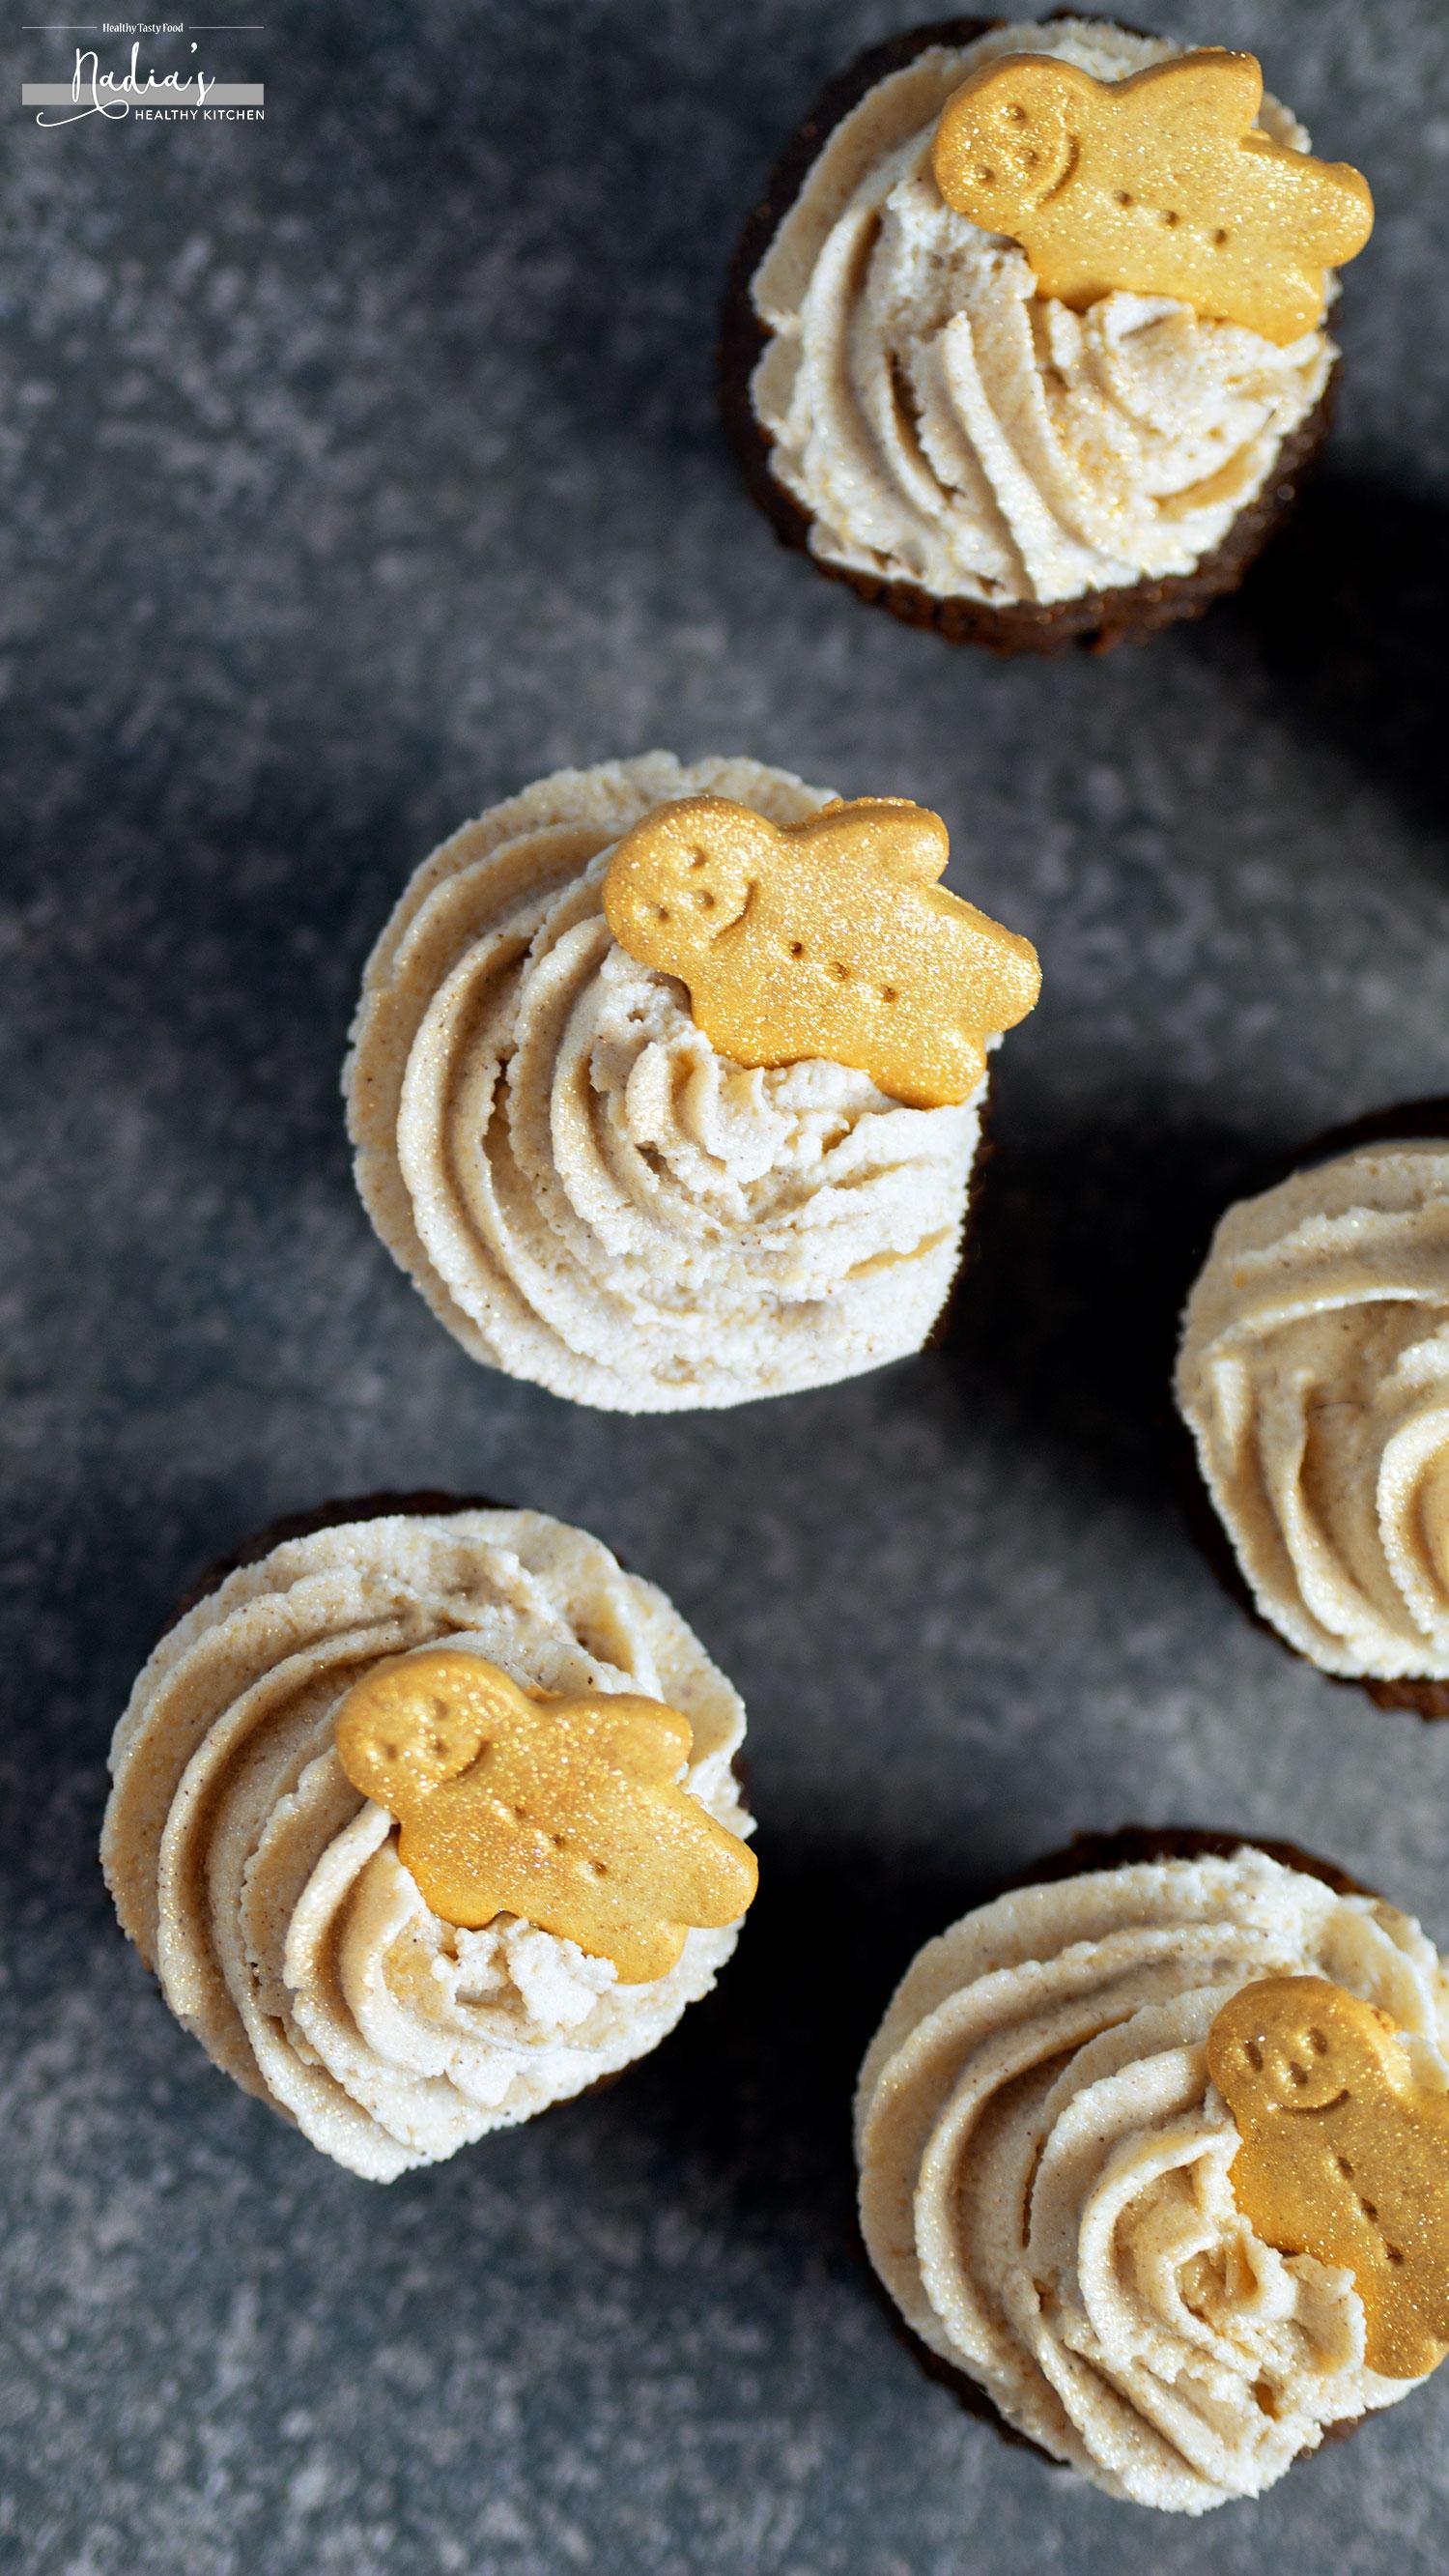 vegan-gluten-free-gingerbread-cupcakes_6